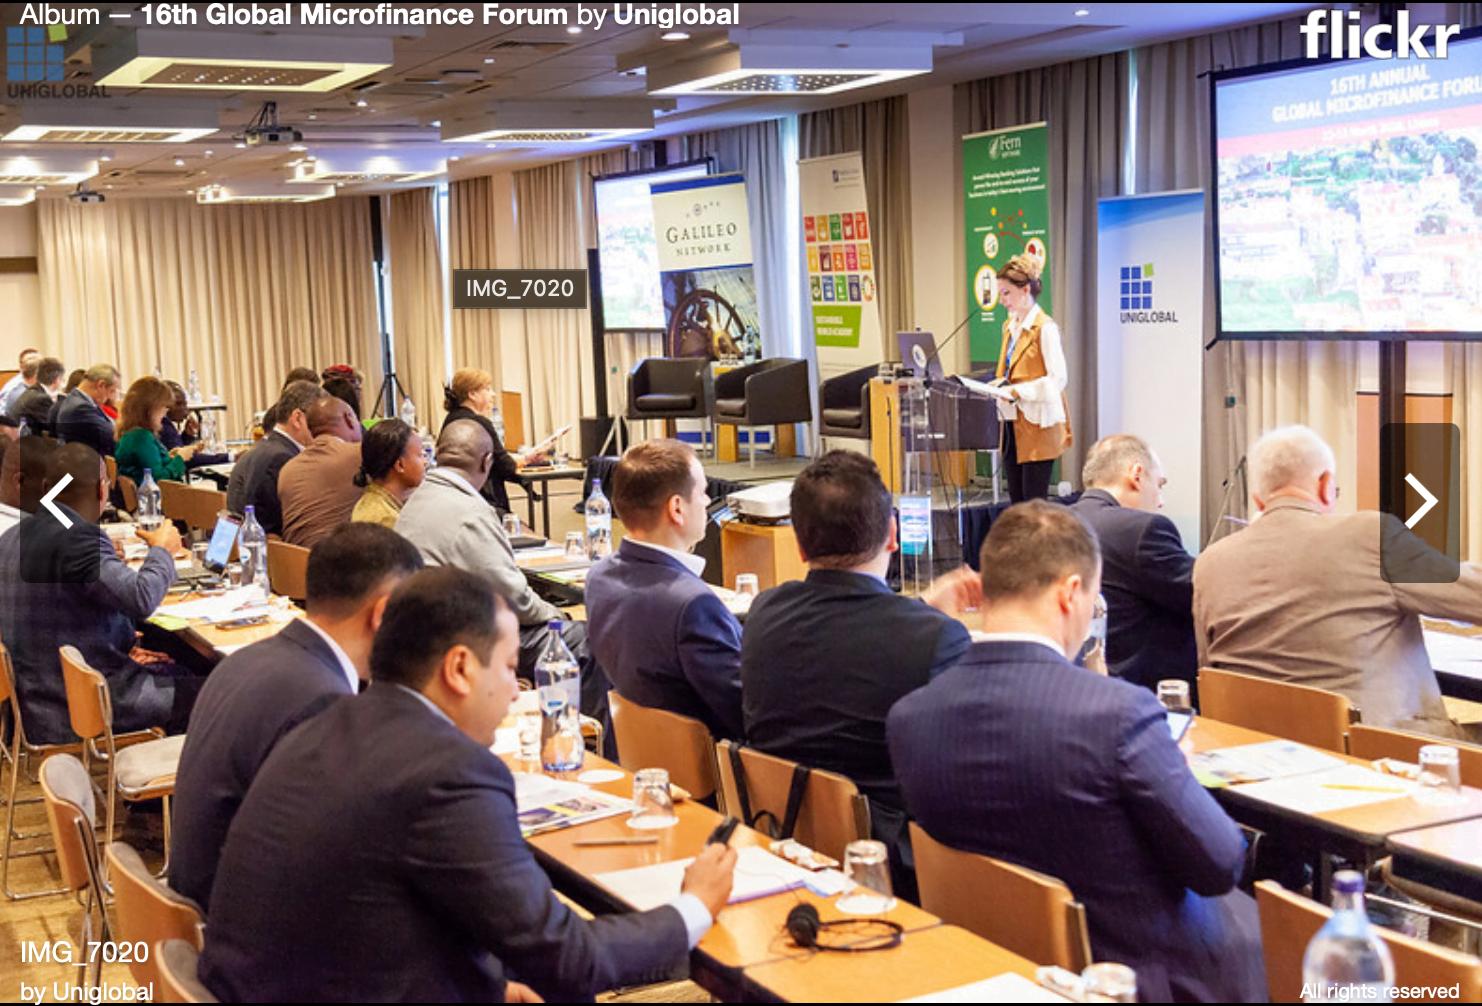 Musoni sponsors Global Microfinance Forum